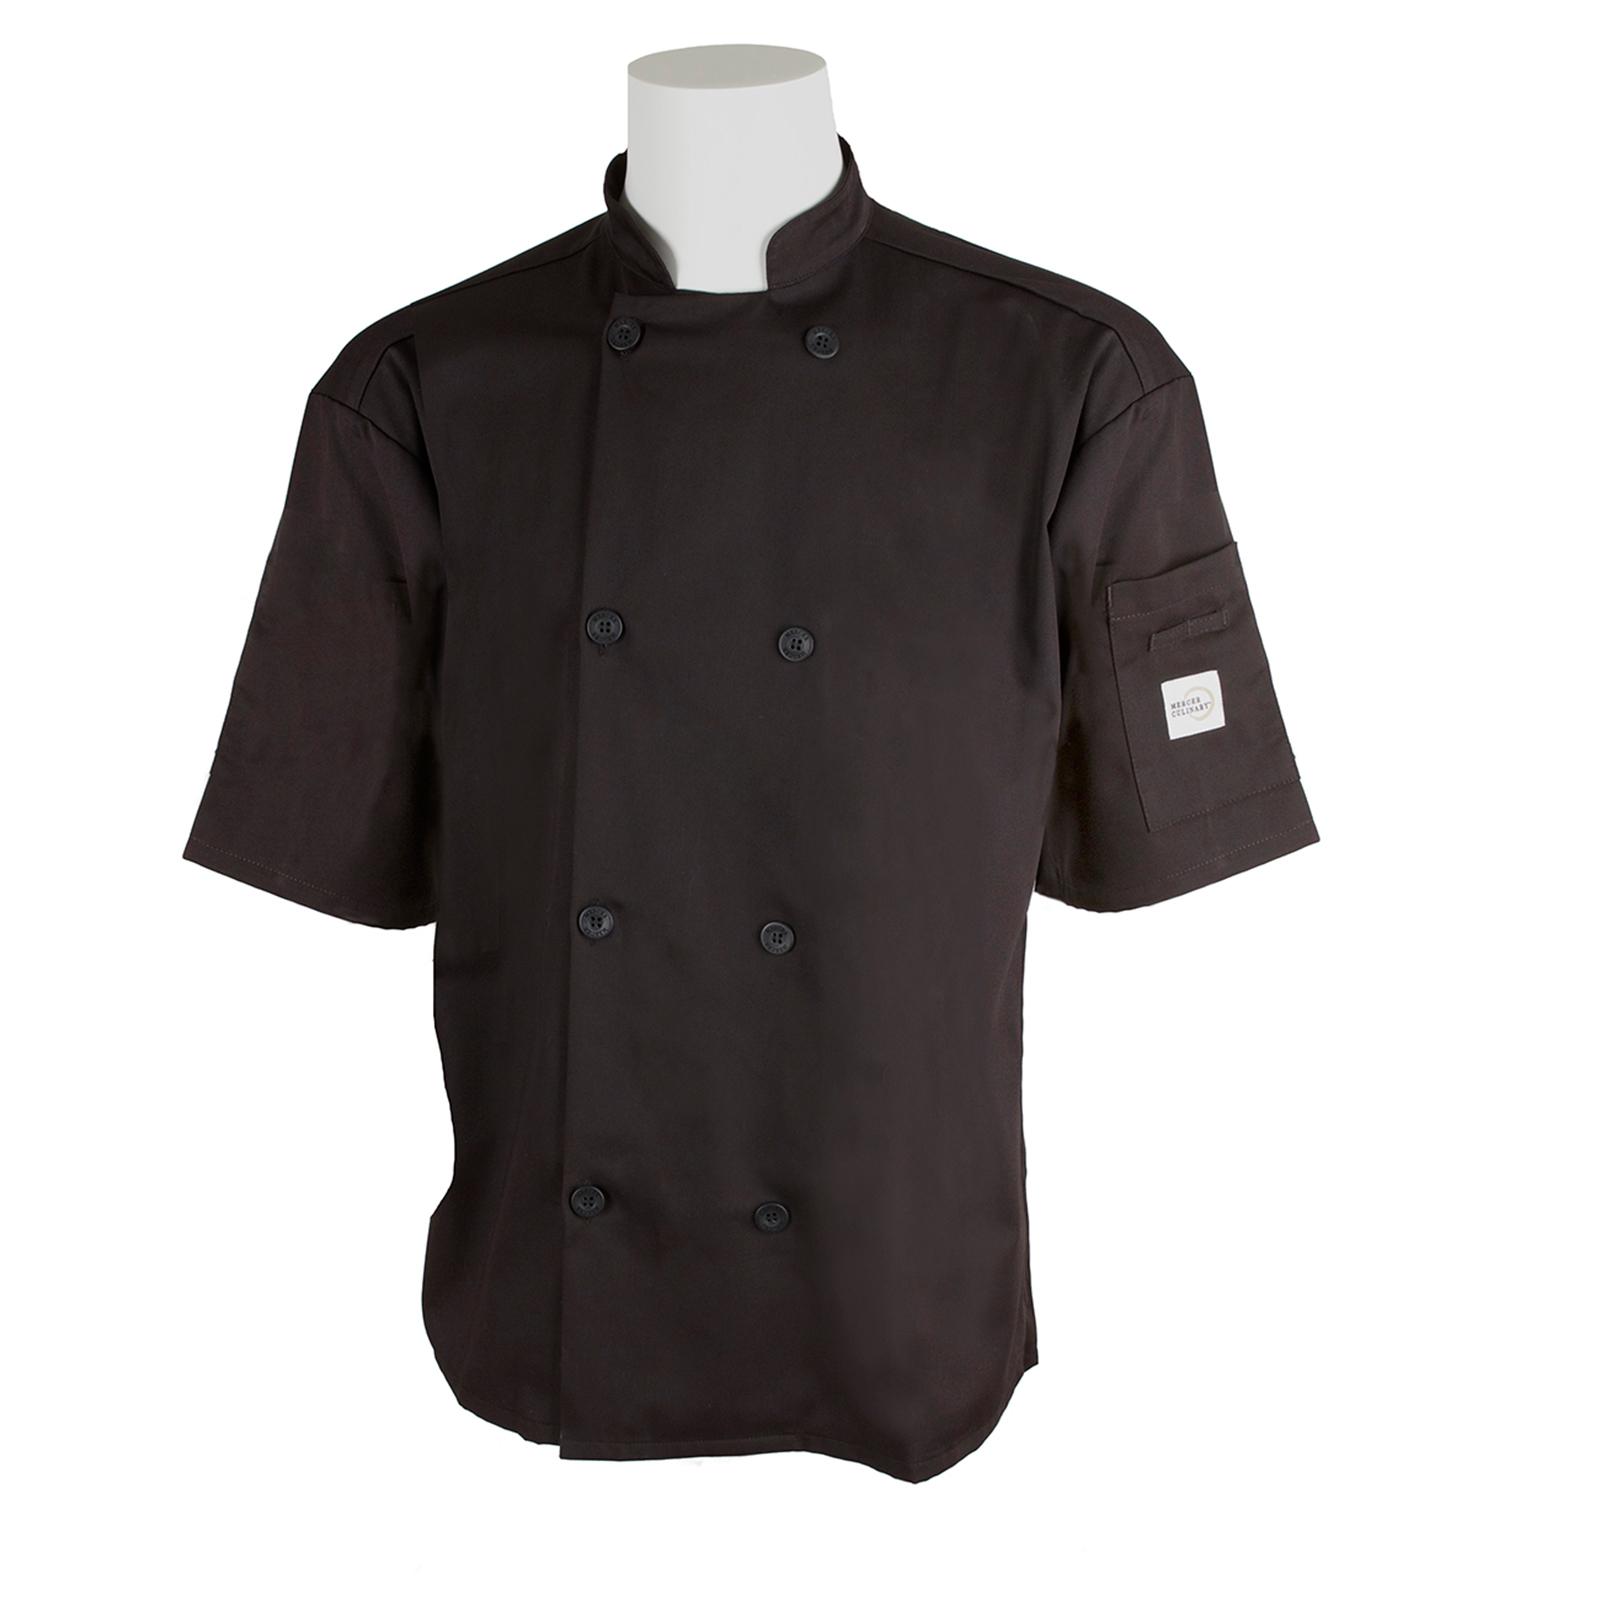 Mercer Culinary M60019BKS chef's coat